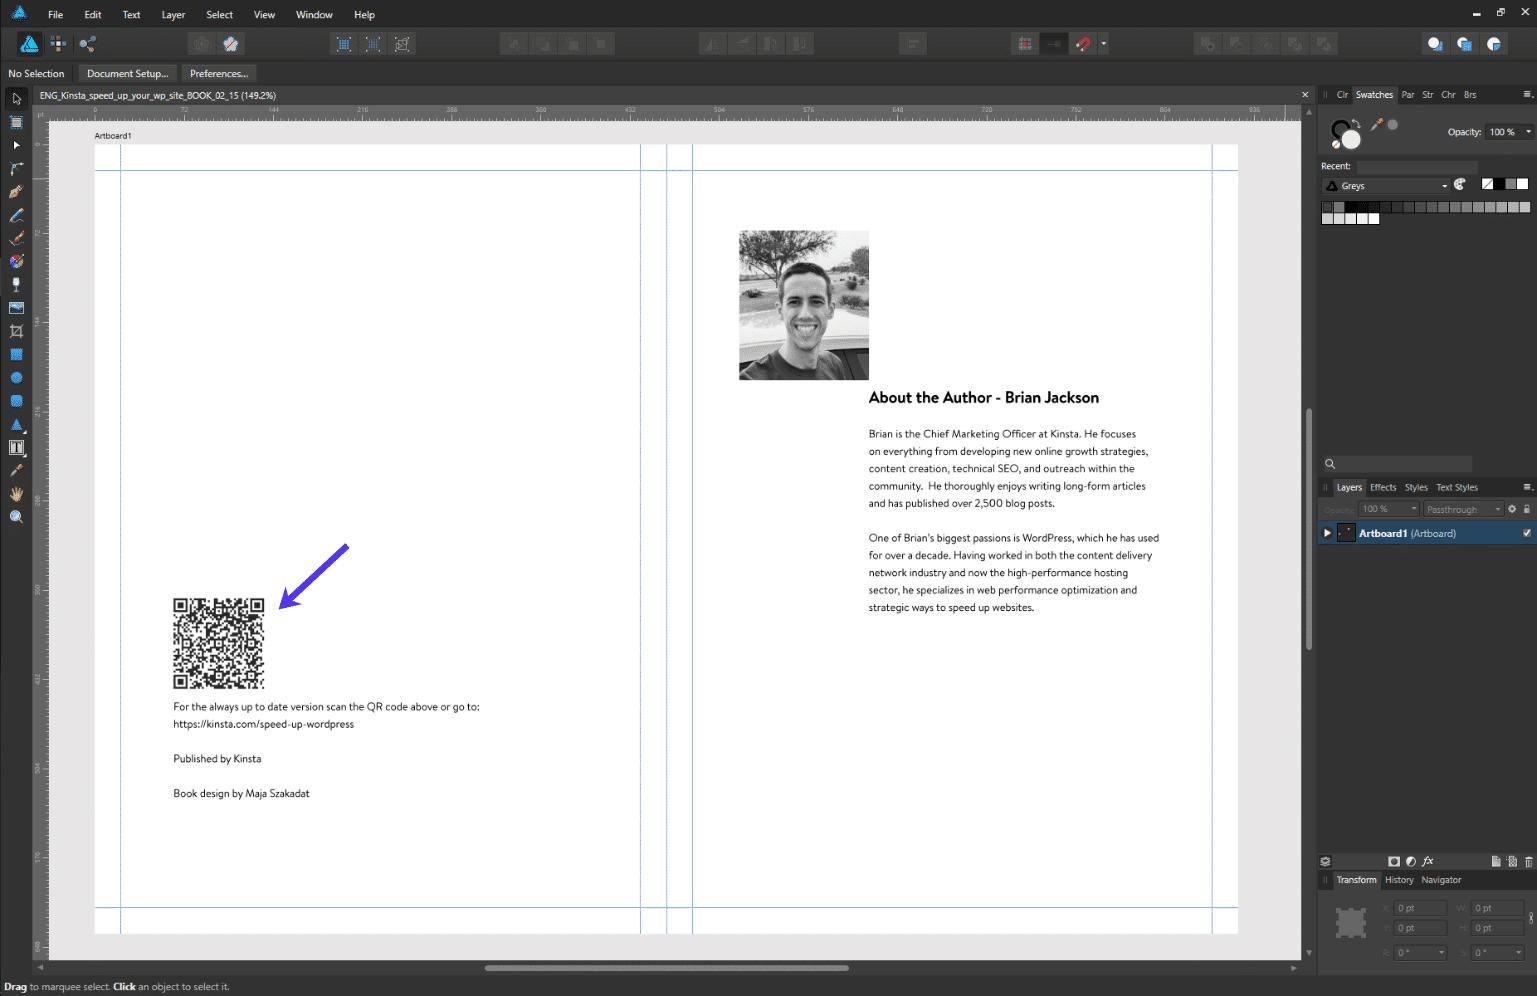 QR code example in printed book